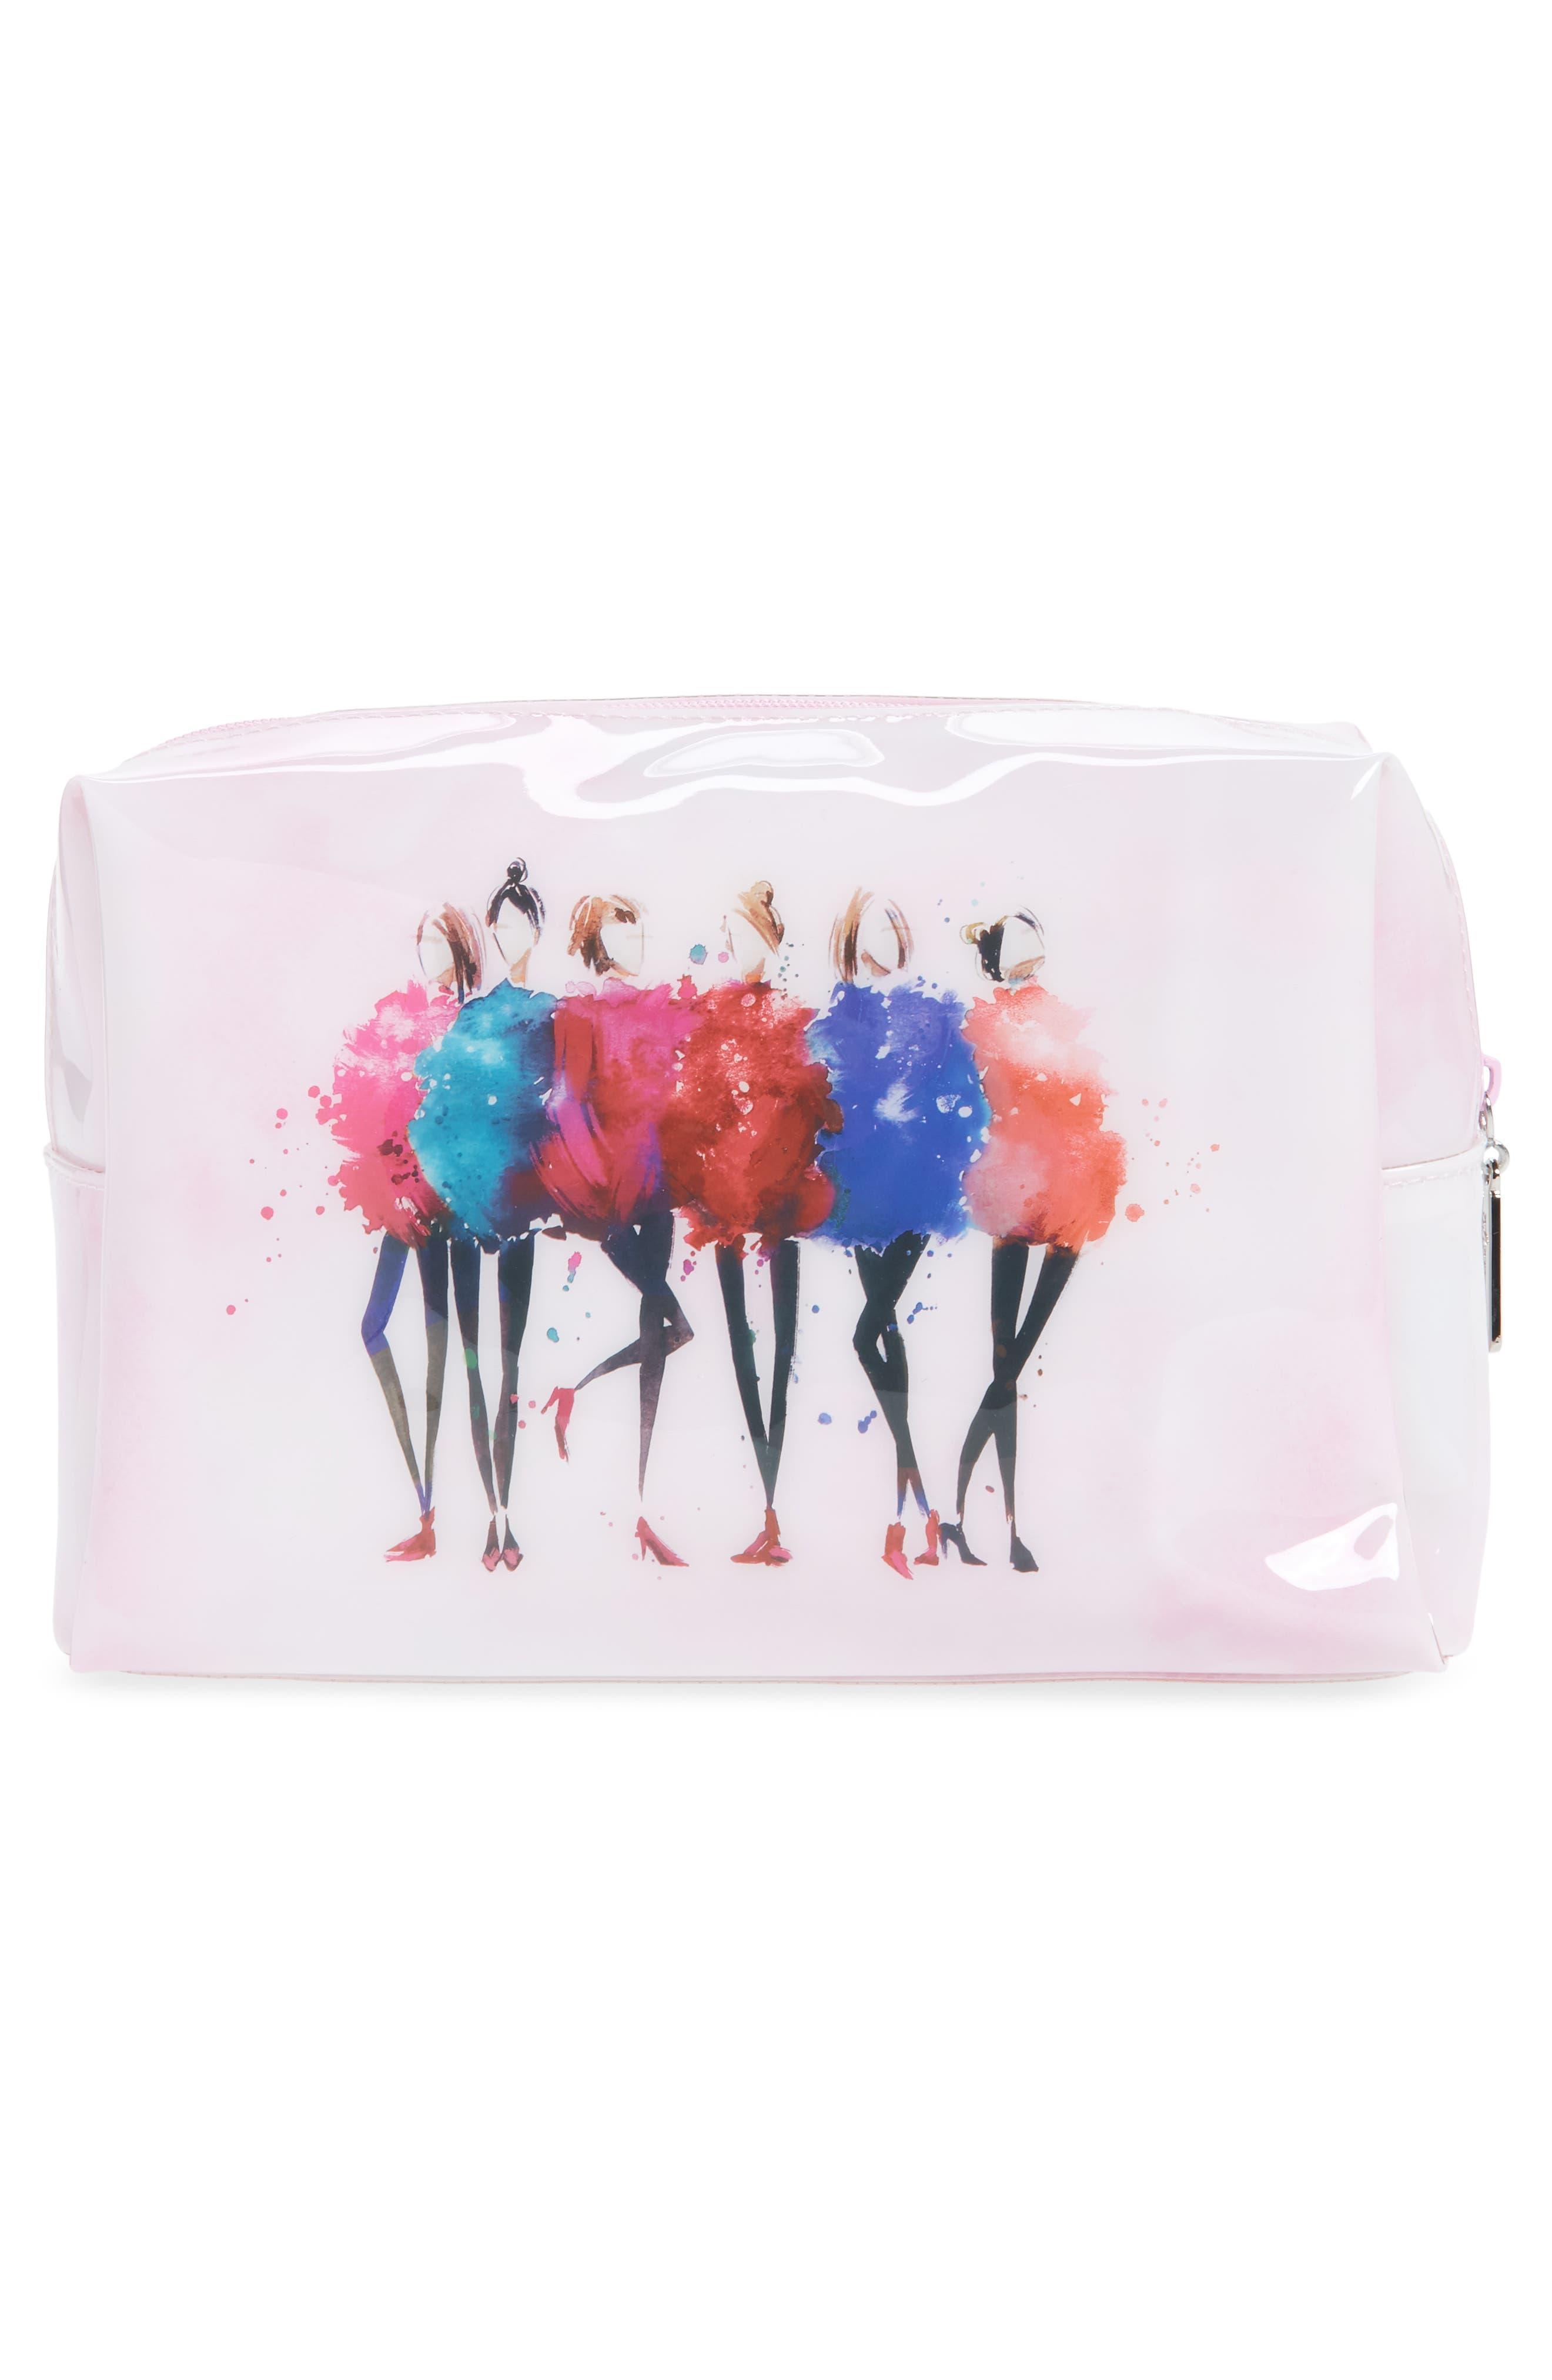 Watercolor Women Large Cosmetics Case,                             Alternate thumbnail 2, color,                             Pink